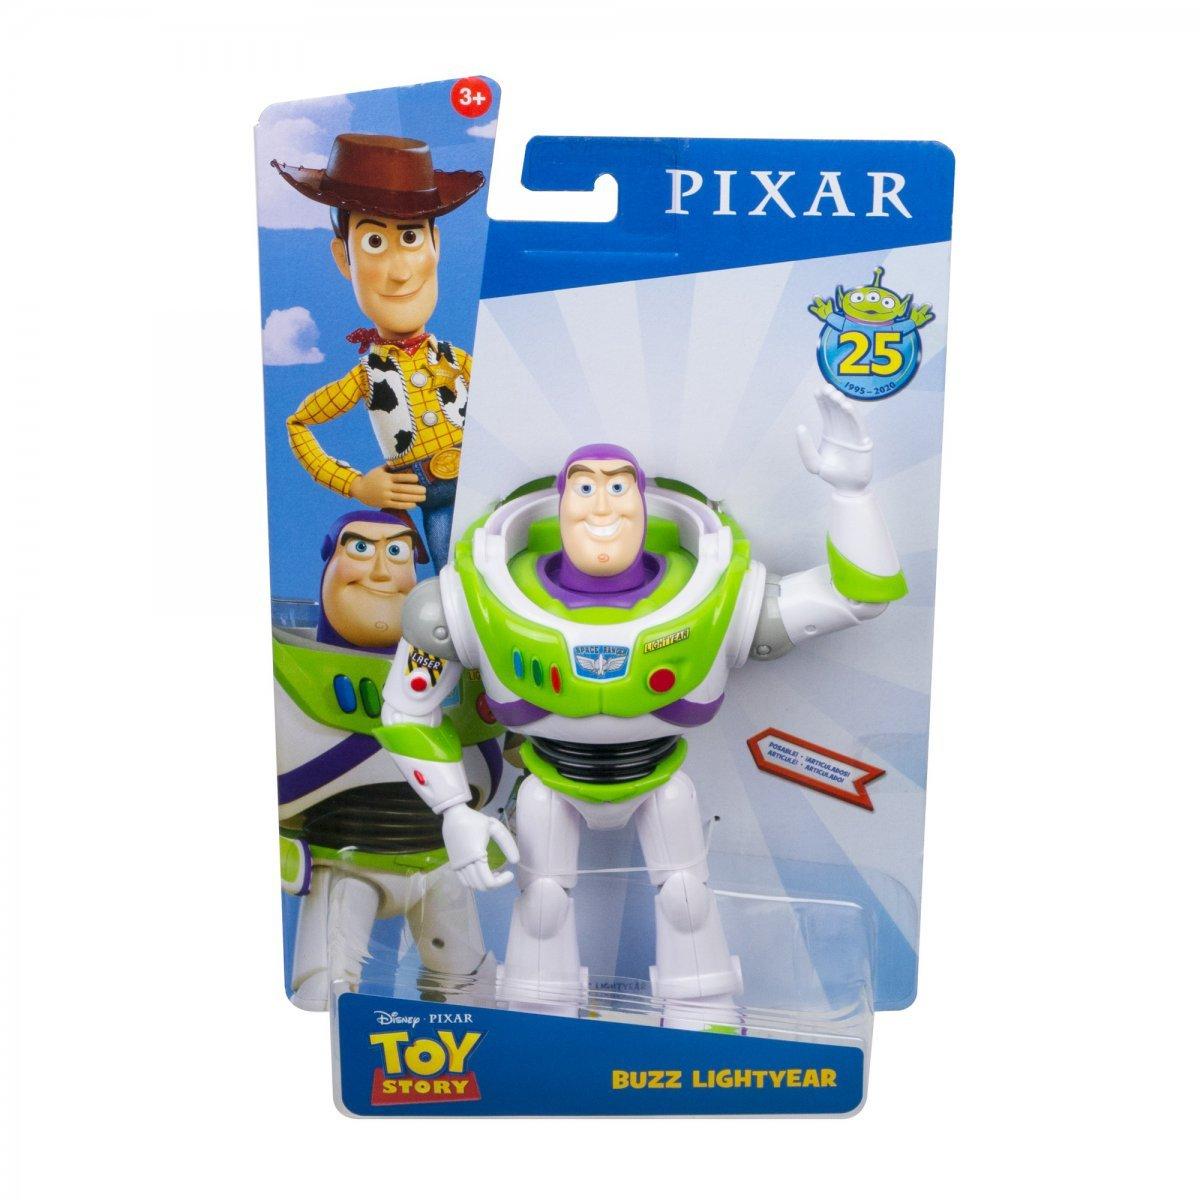 Boneco Toy Story Buzz Lightyear Articulado - Mattel Gdp69